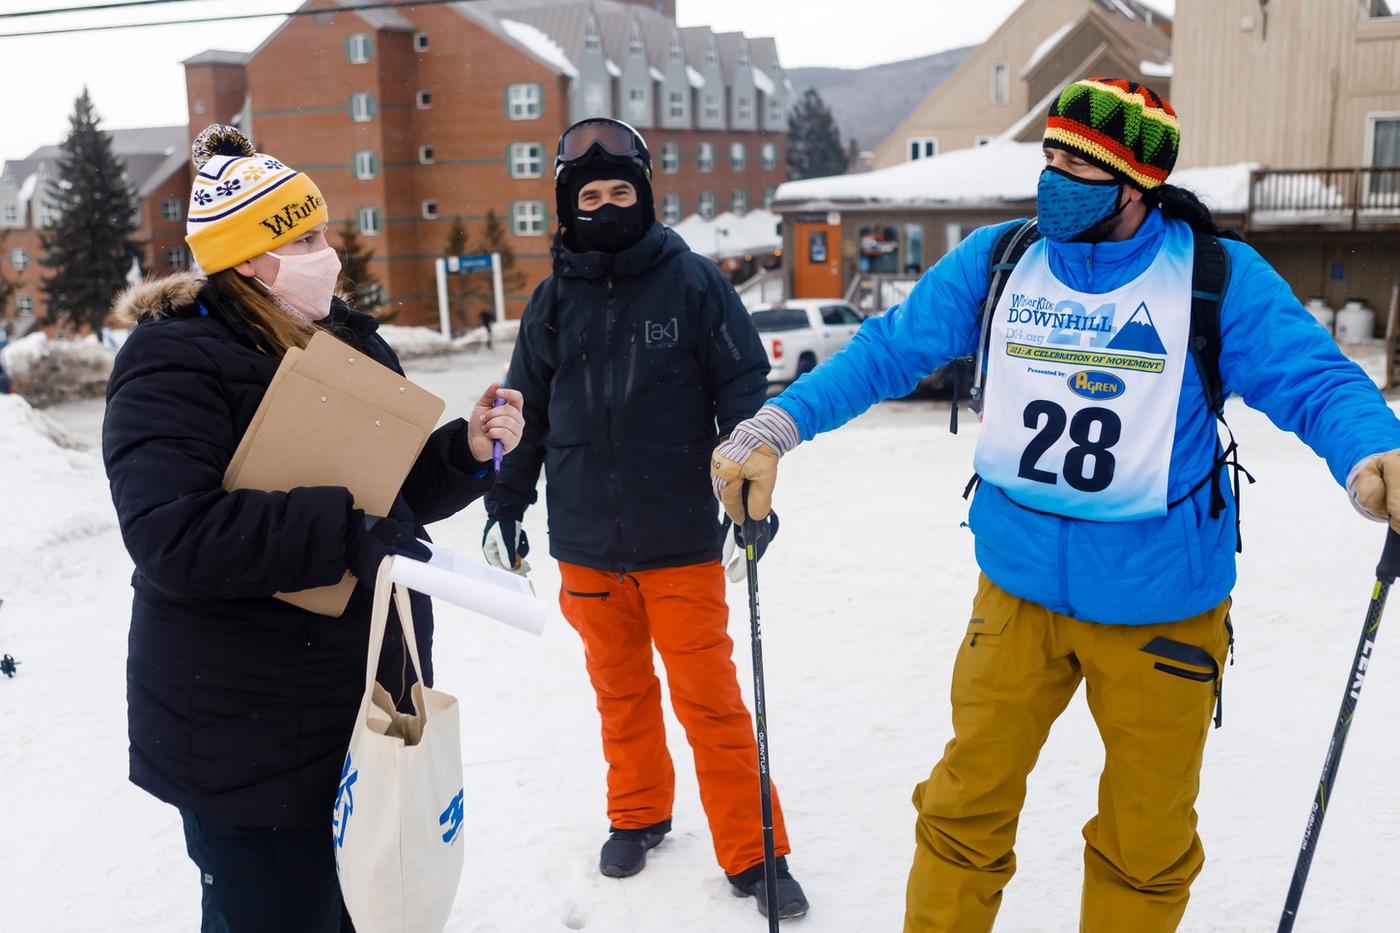 WinterKids Downhill 24 2021 SDP 3598